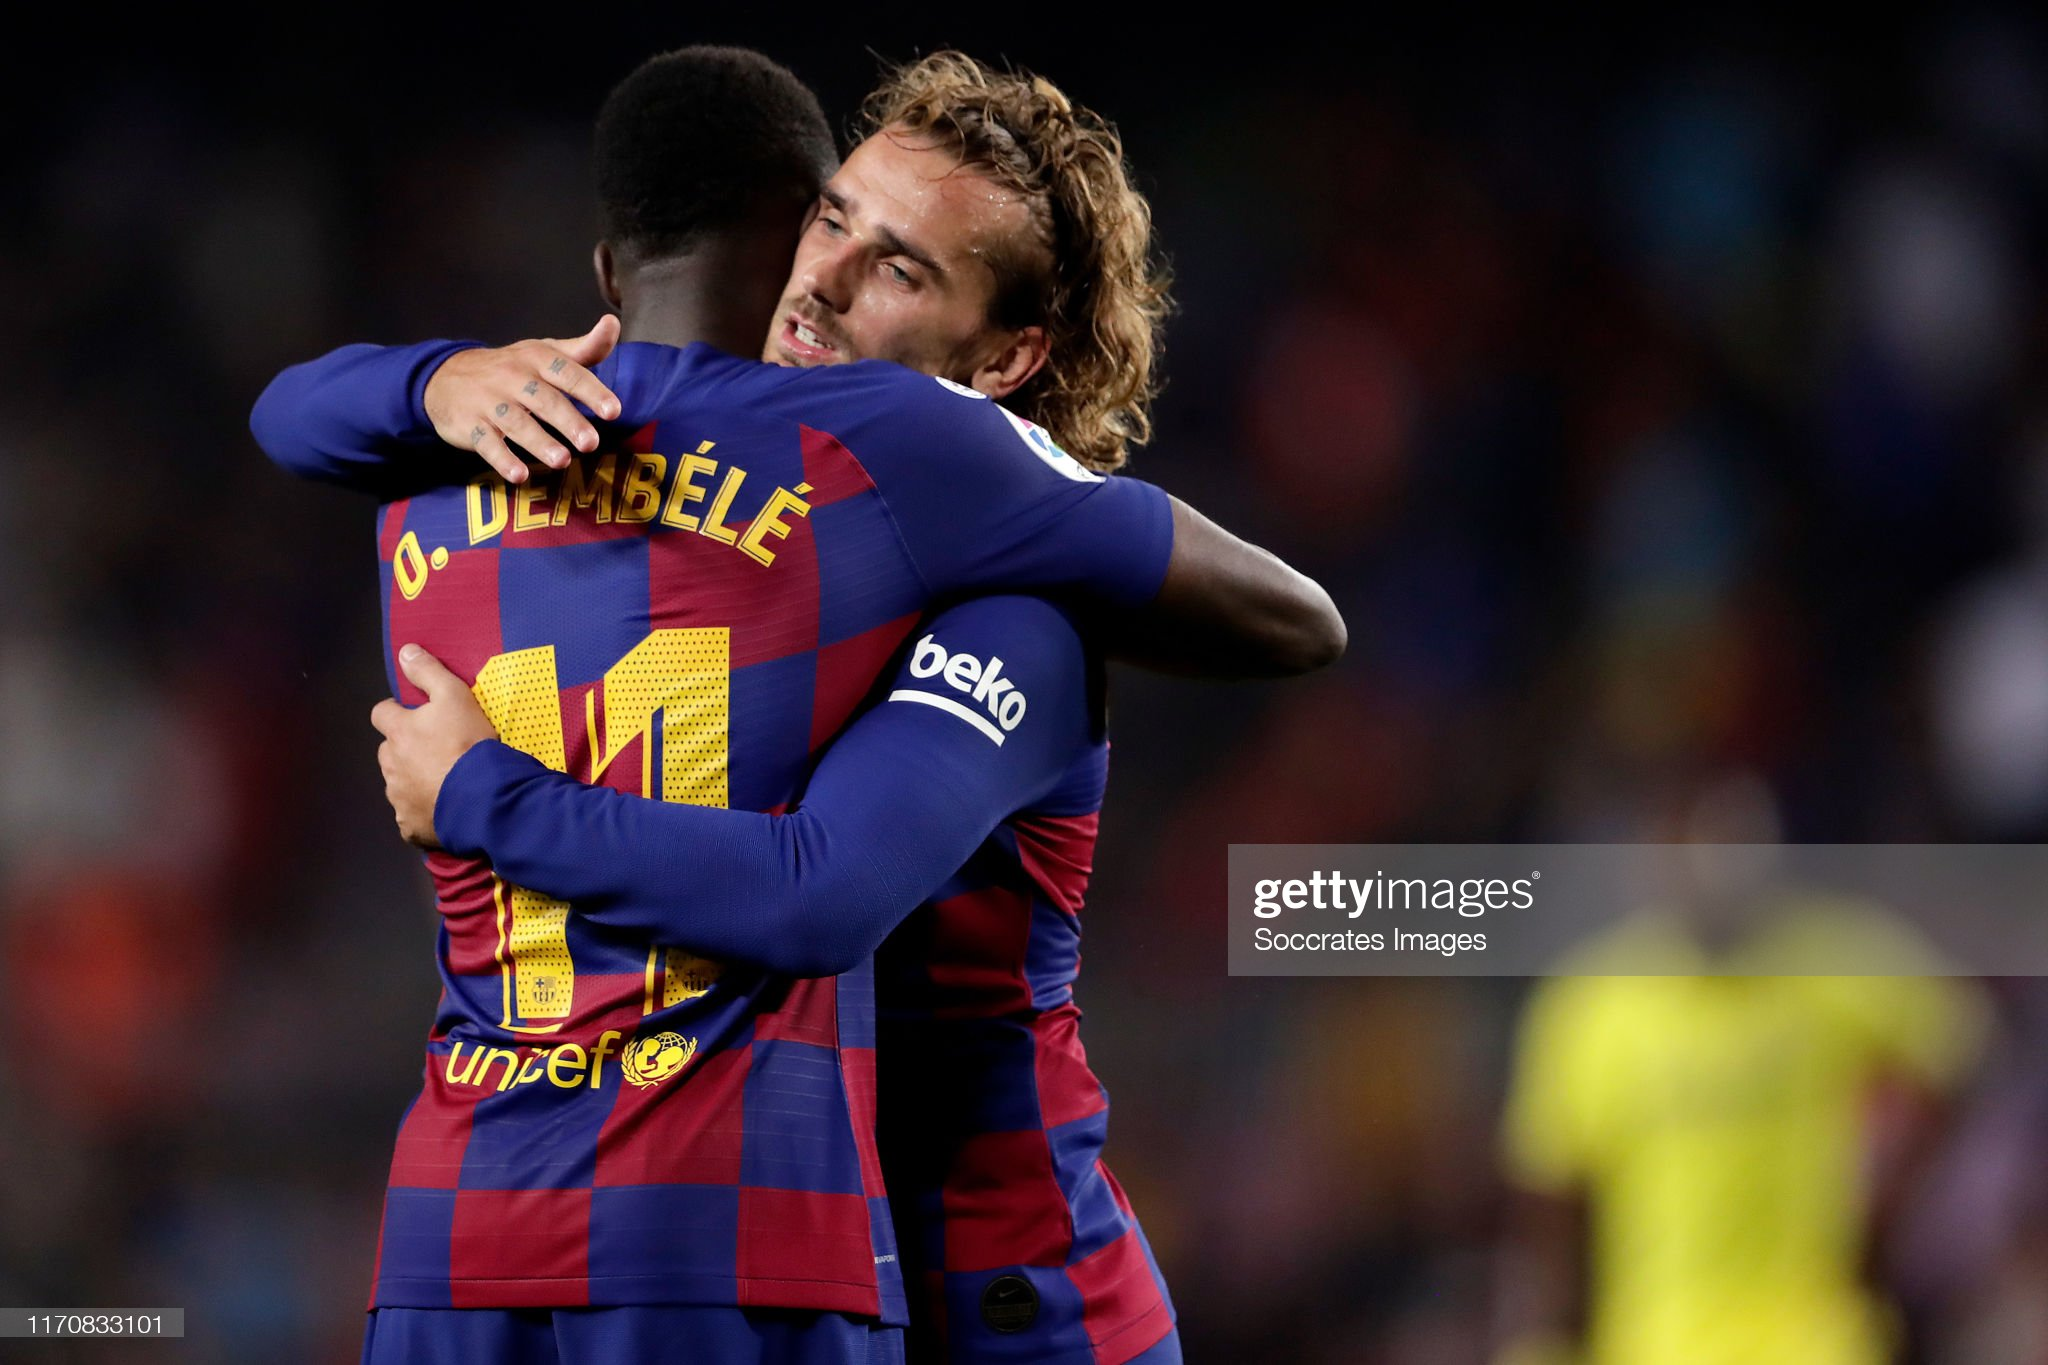 صور مباراة : برشلونة - فياريال 2-1 ( 24-09-2019 )  Ousmane-dembele-of-fc-barcelona-antoine-griezmann-of-fc-barcelona-picture-id1170833101?s=2048x2048